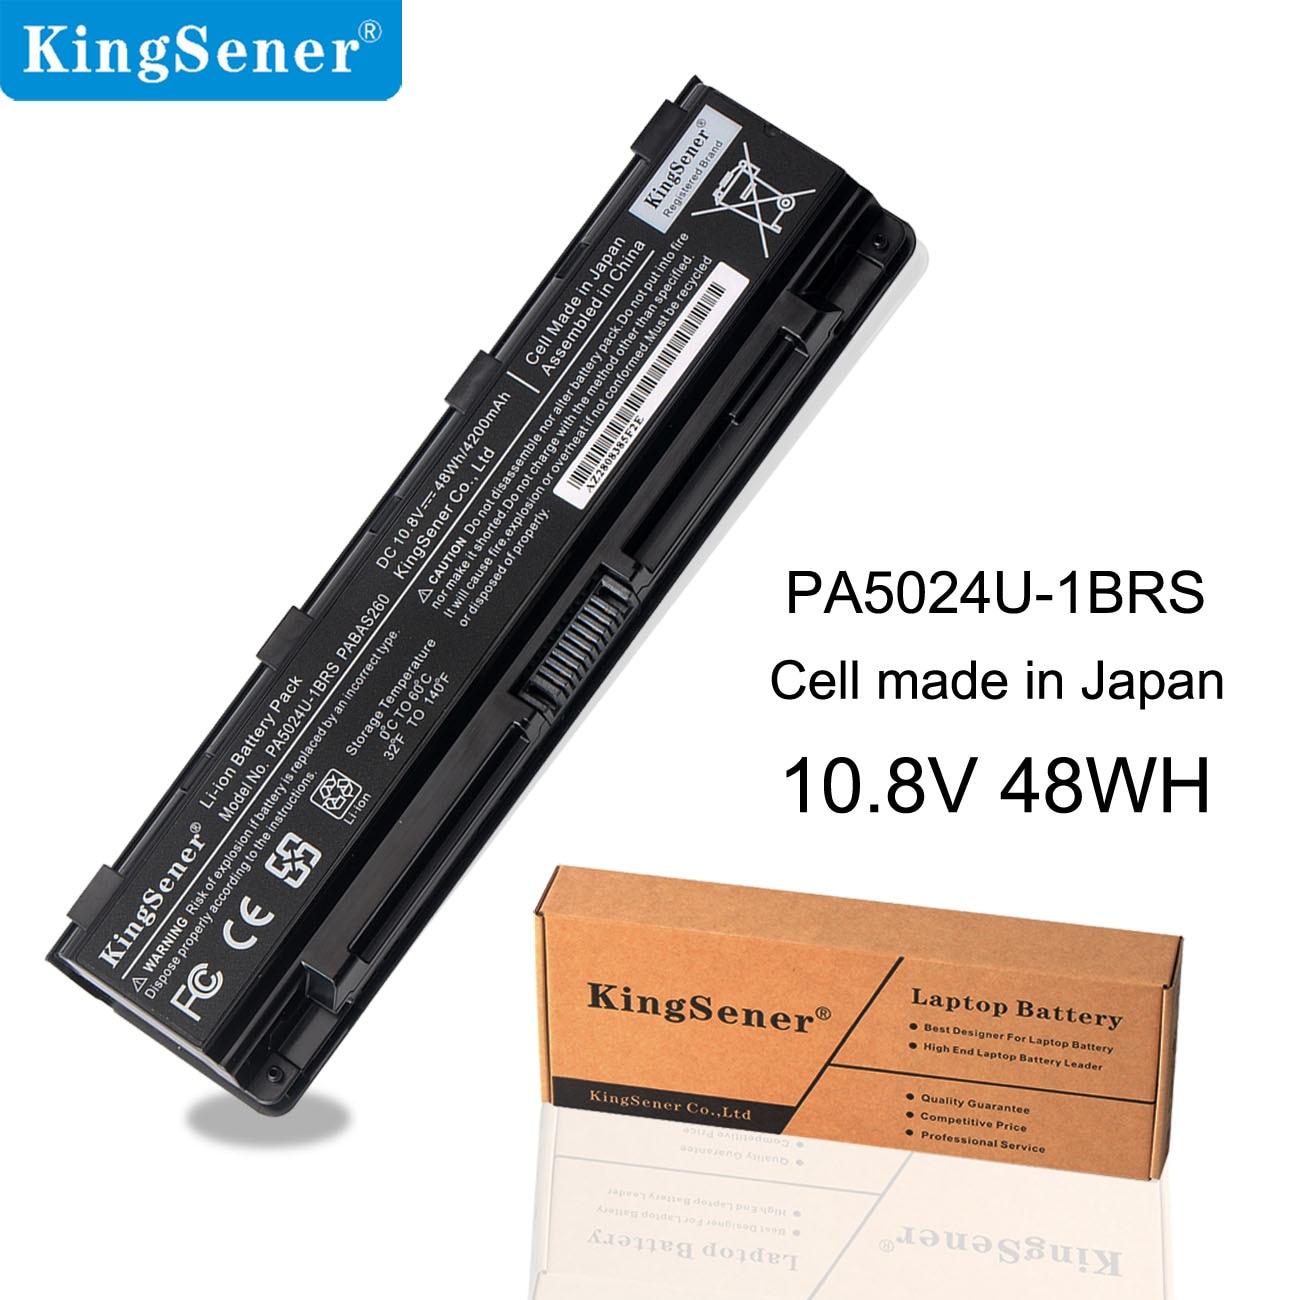 Kingsener PA5024U-1BRS Laptop Battery for Toshiba Satellite C850 C850D C855D C855 C870 C875 C800 PA5023U-1BRS PA5024U PABAS260